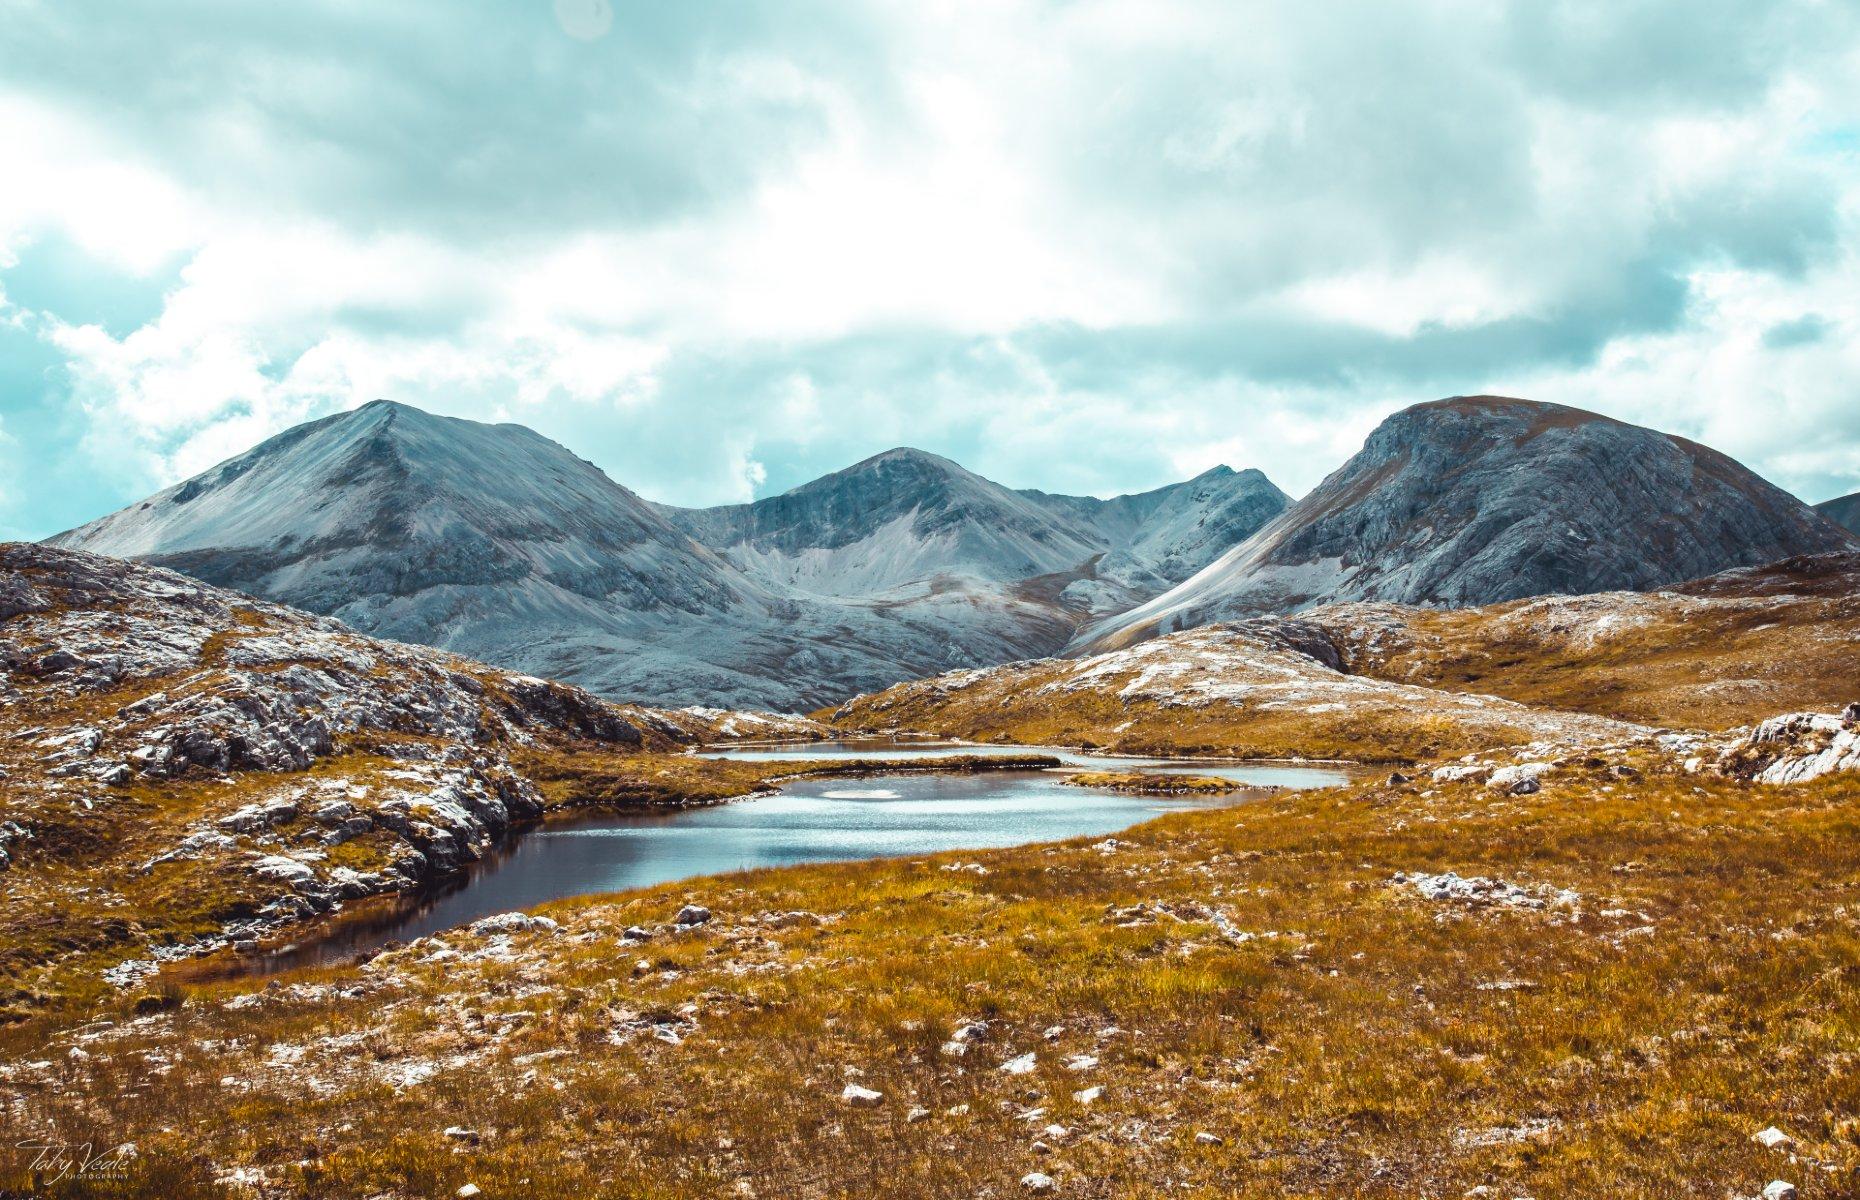 Beinn Eighe mountain trail (Image: TVeale/Shutterstock)